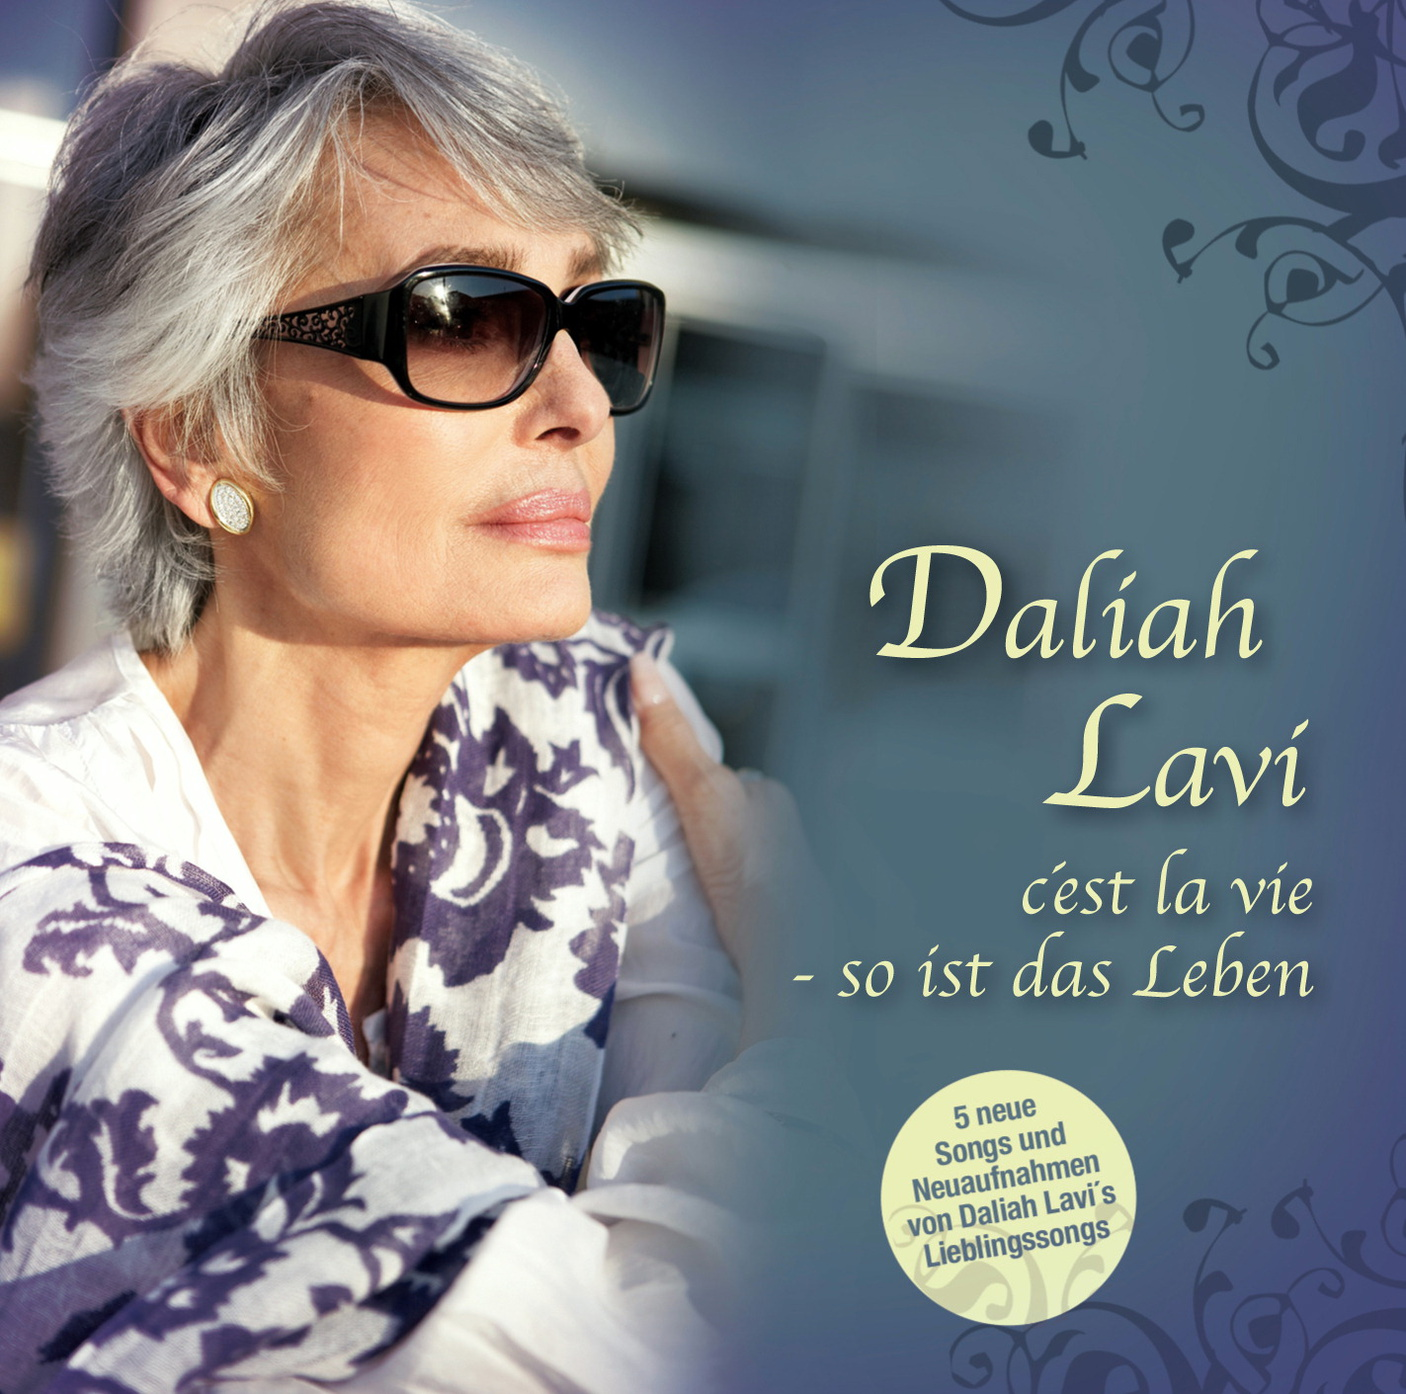 Daliah Lavi - C´est La Vie - So ist das Leben